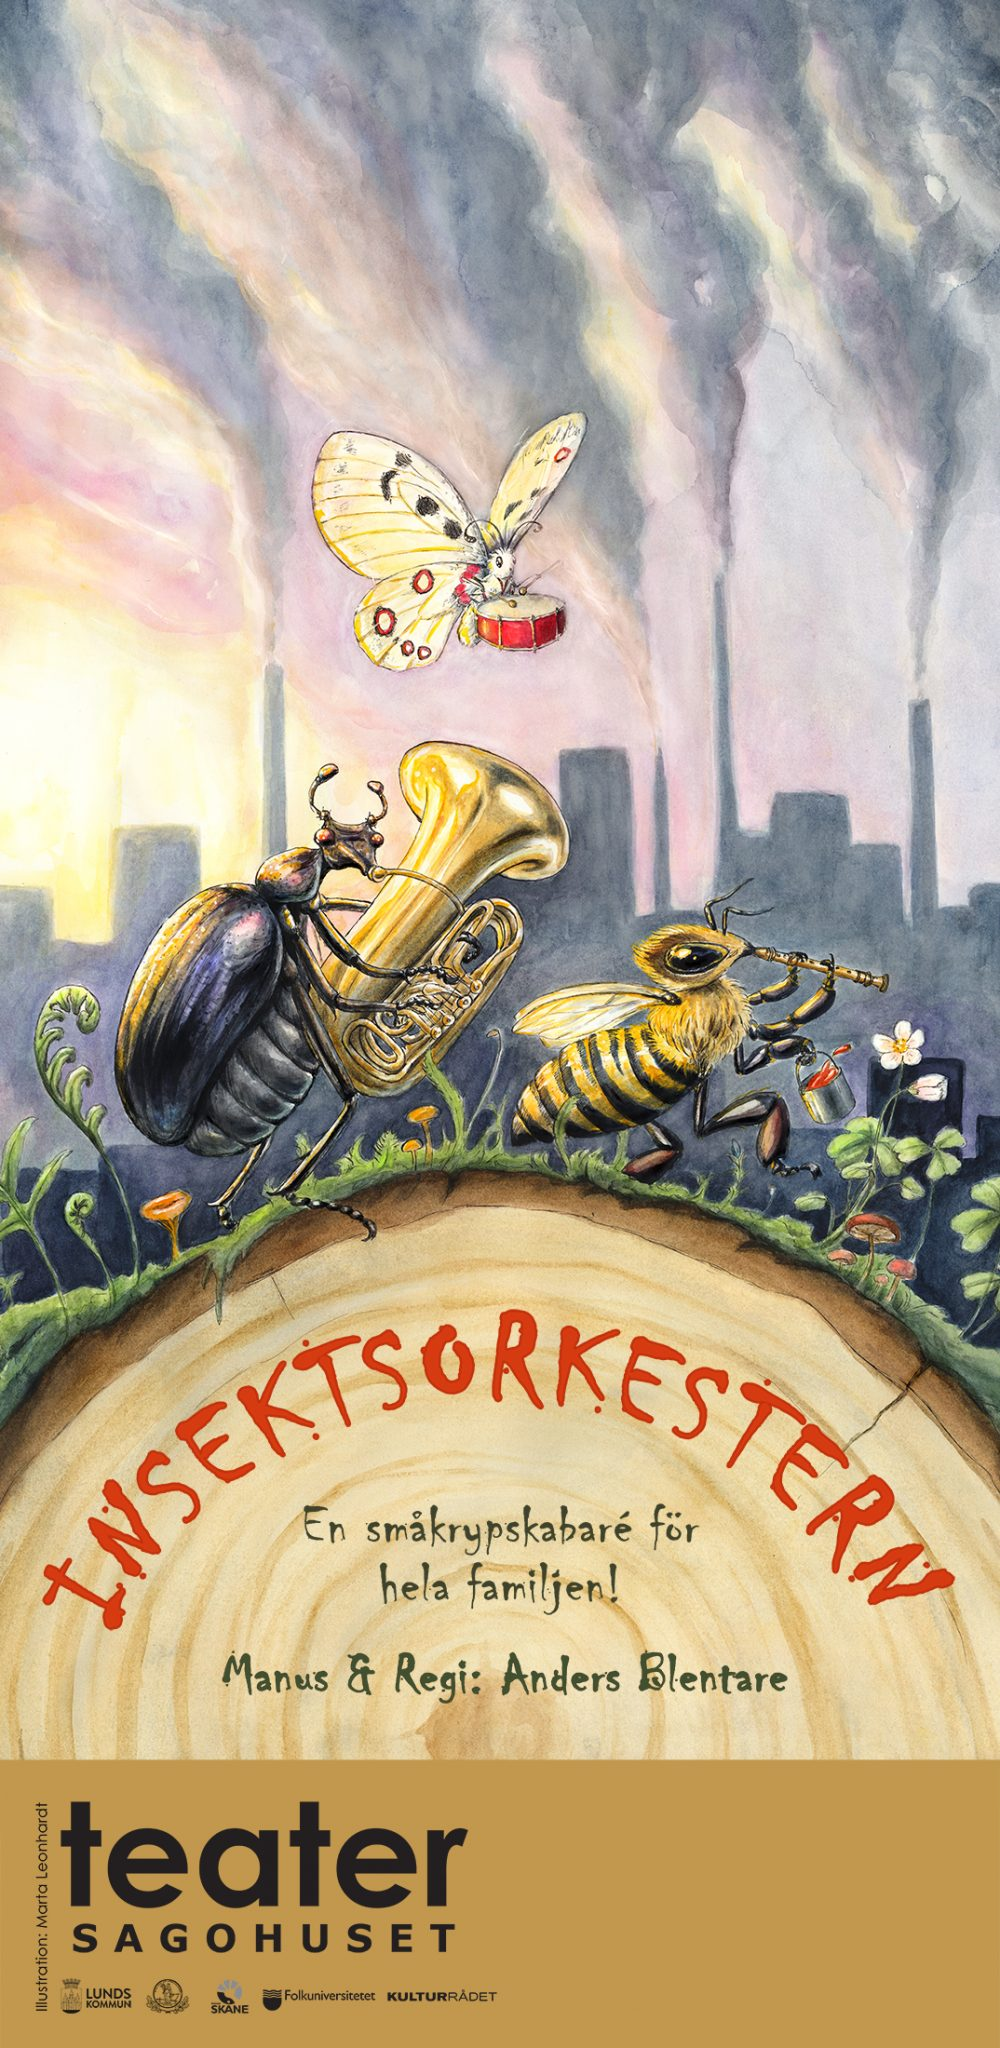 Insektsorkestern affisch